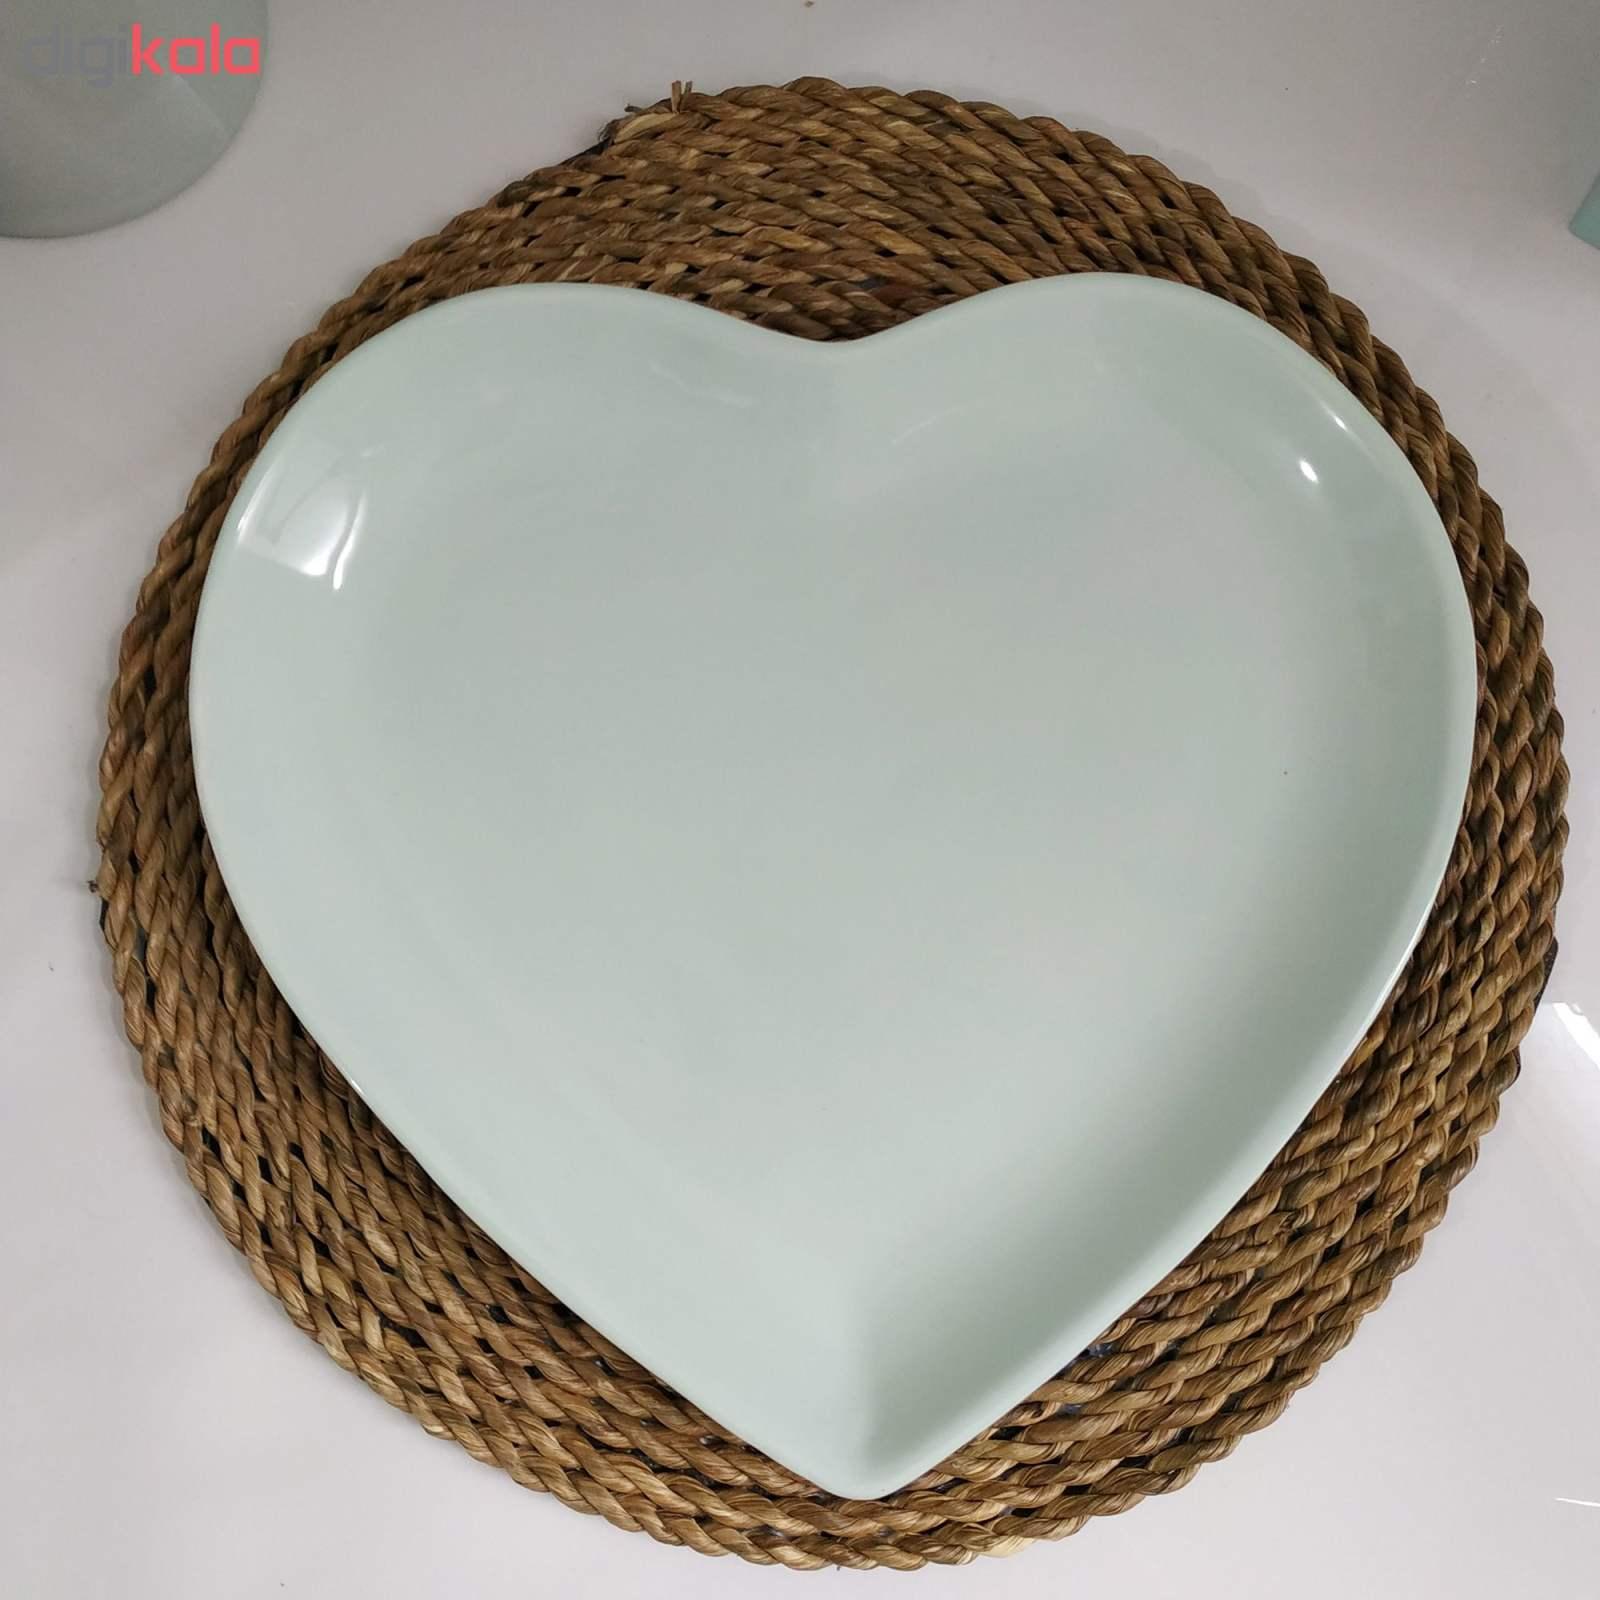 بشقاب غذاخوری طرح قلب کد093 بسته 2 عددی thumb 2